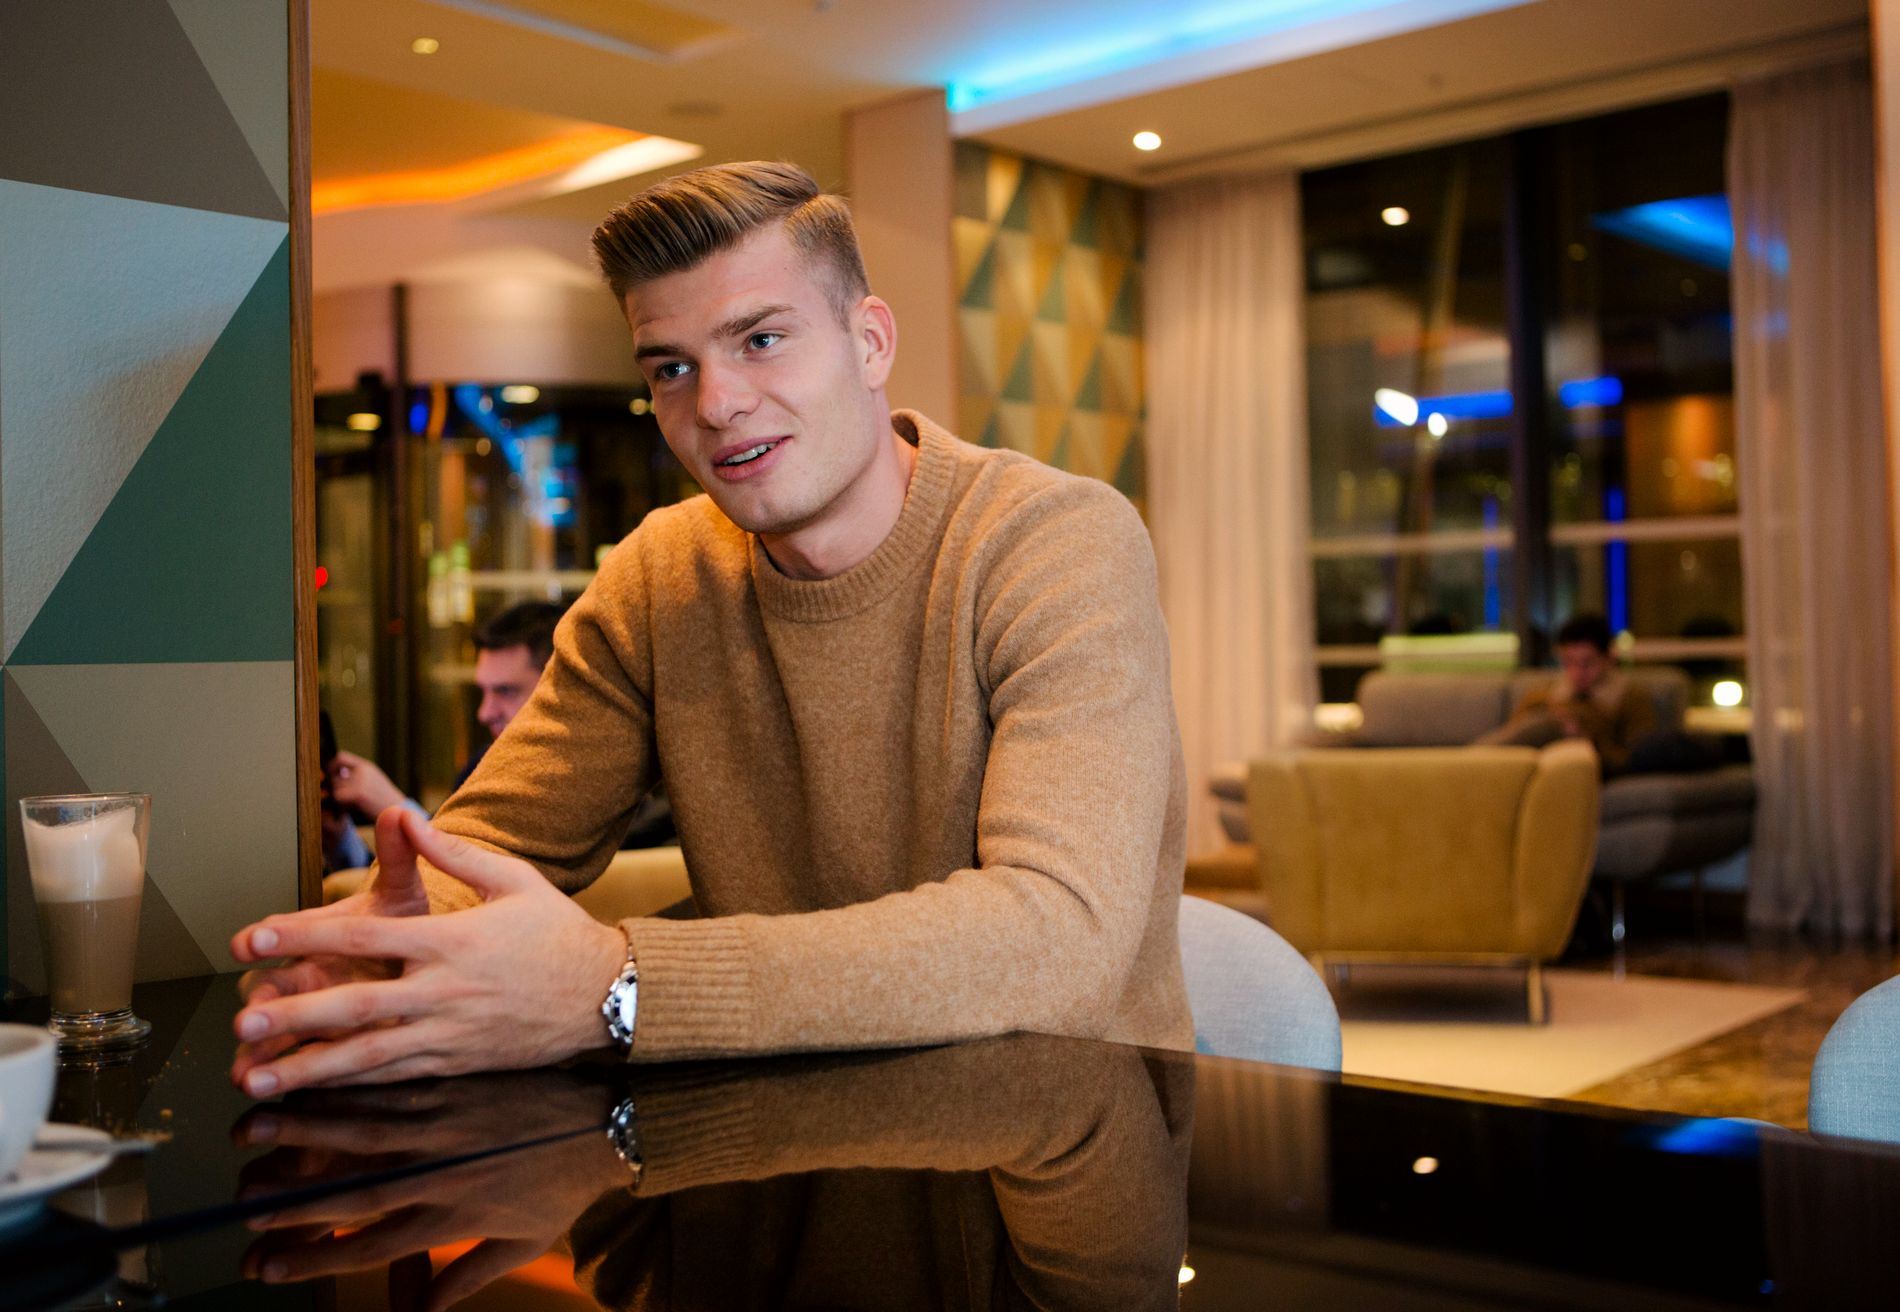 LETTET: Alexander Sørloth i samtale med VG på et hotell i London etter overgangen til Crystal Palace.